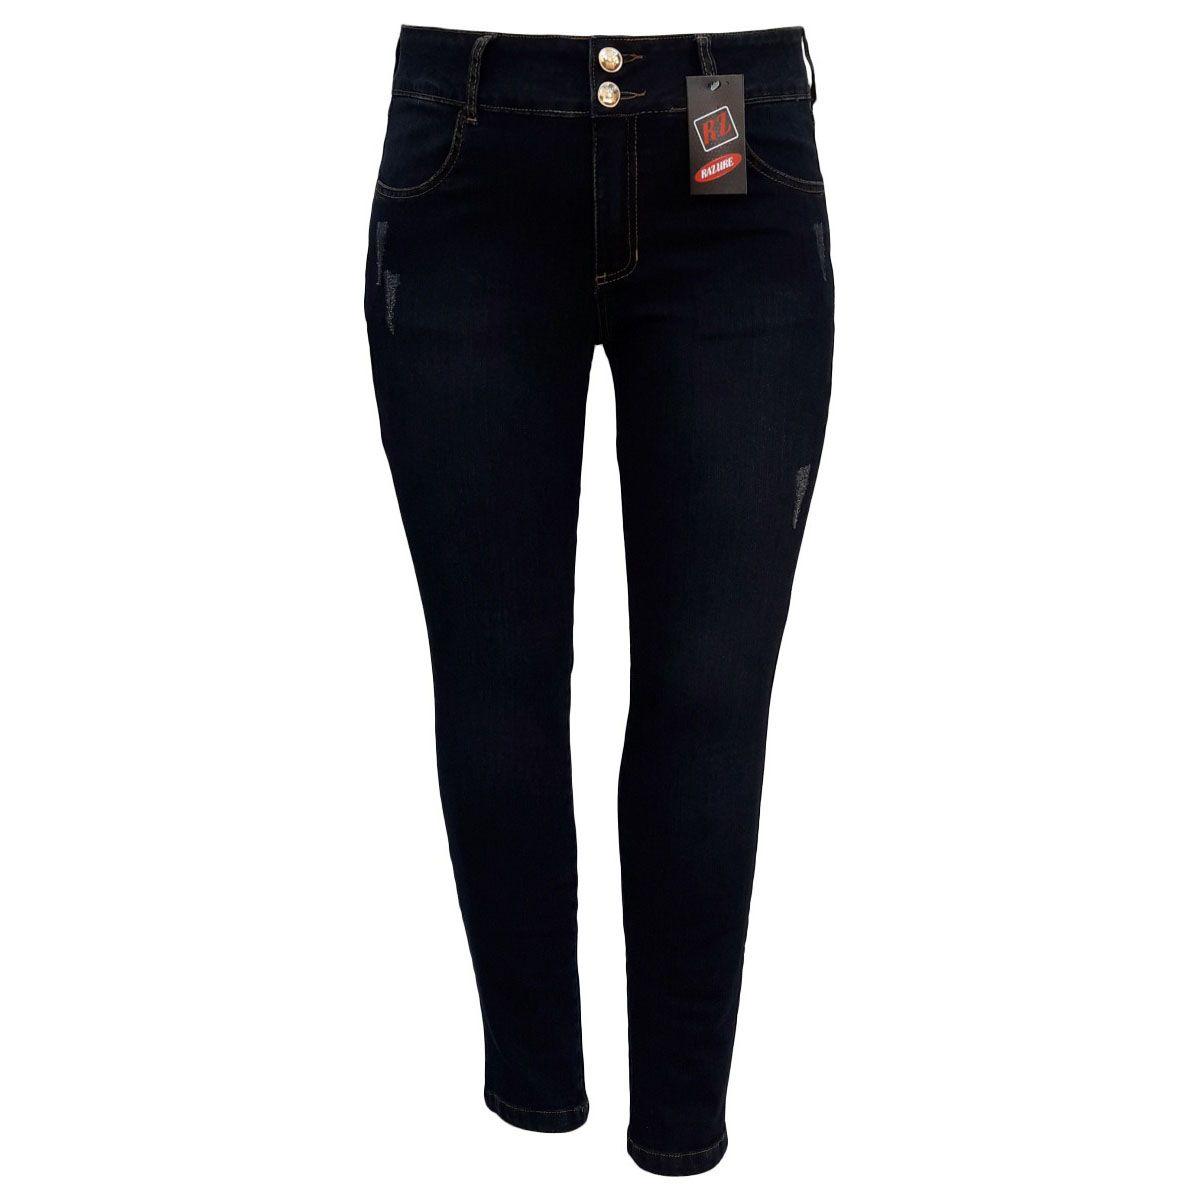 Calça Jeans Feminina Skinny Plus Size